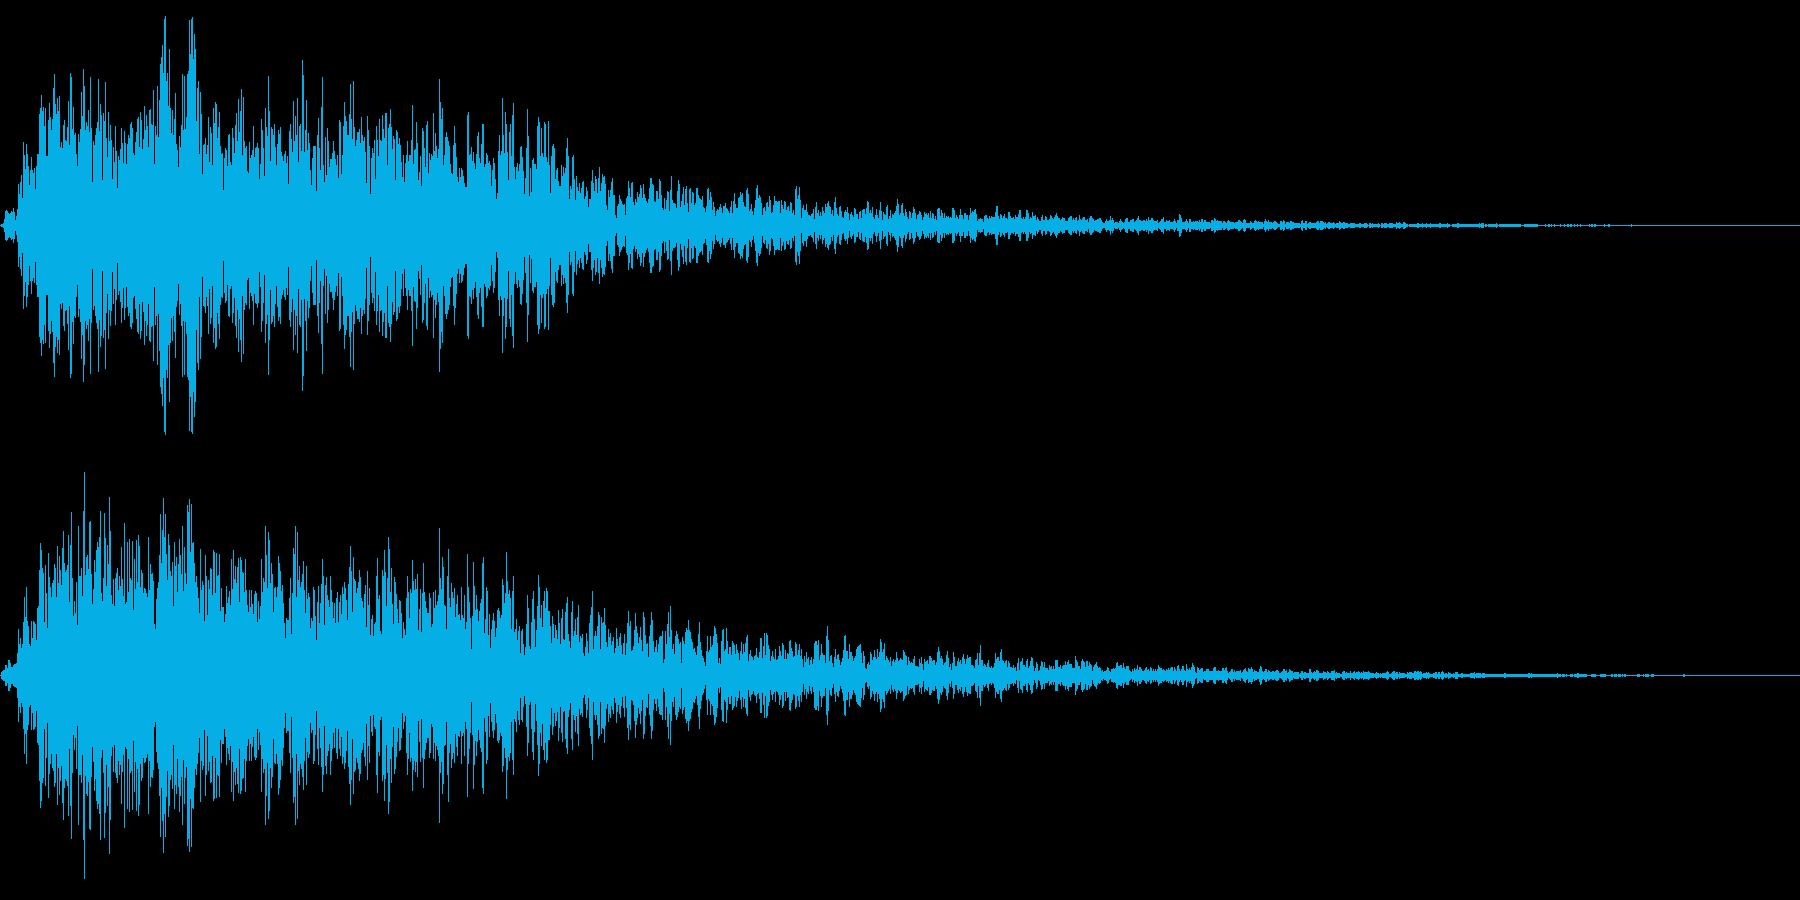 Animal 哀愁が漂うカラスの鳴き声の再生済みの波形